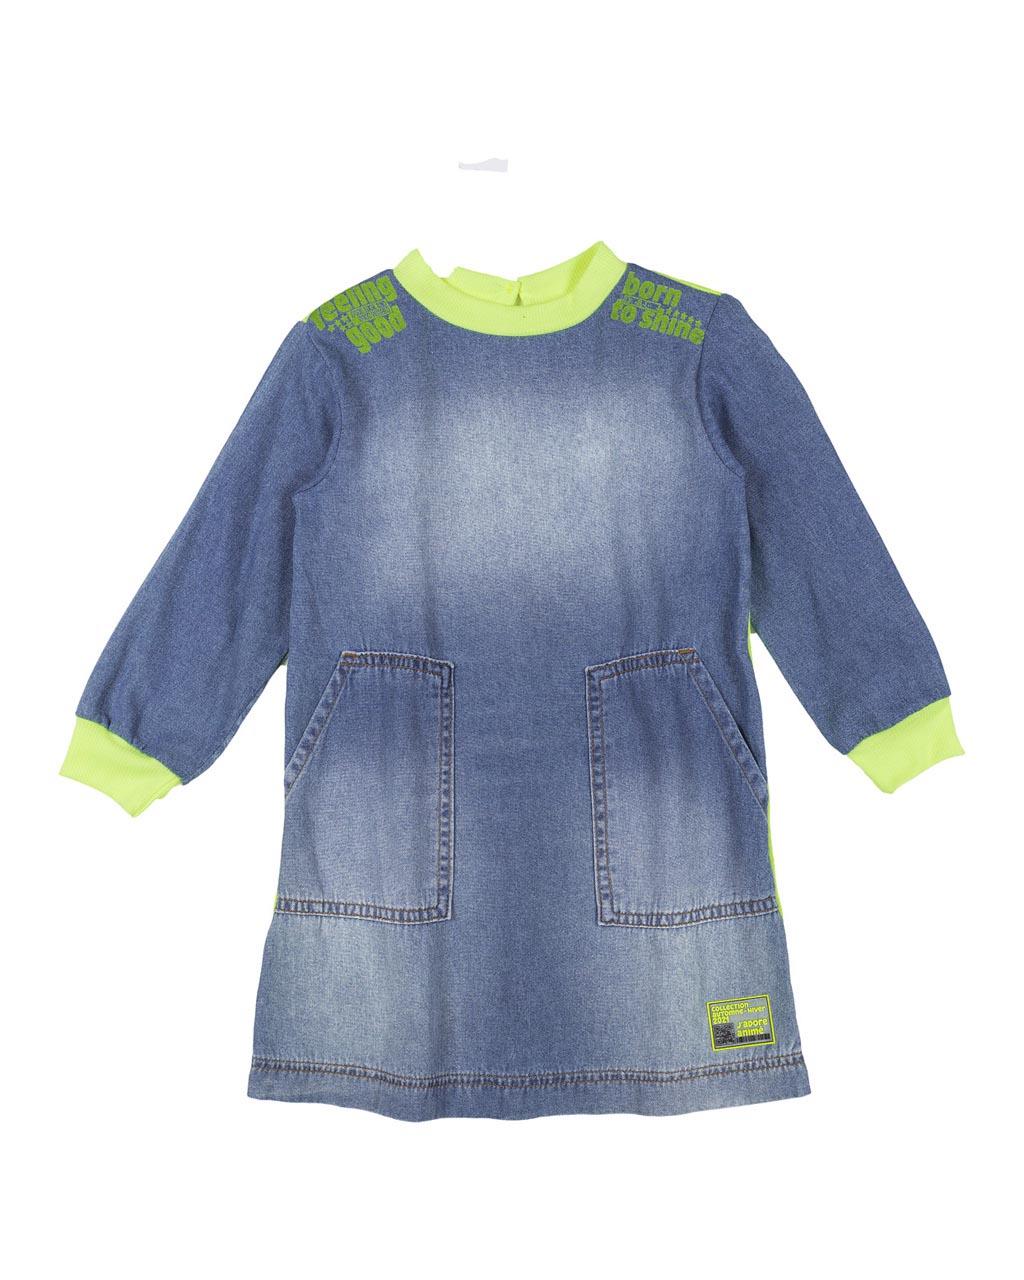 Vestido Infantil Jeans Com Detalhes Neon Animê